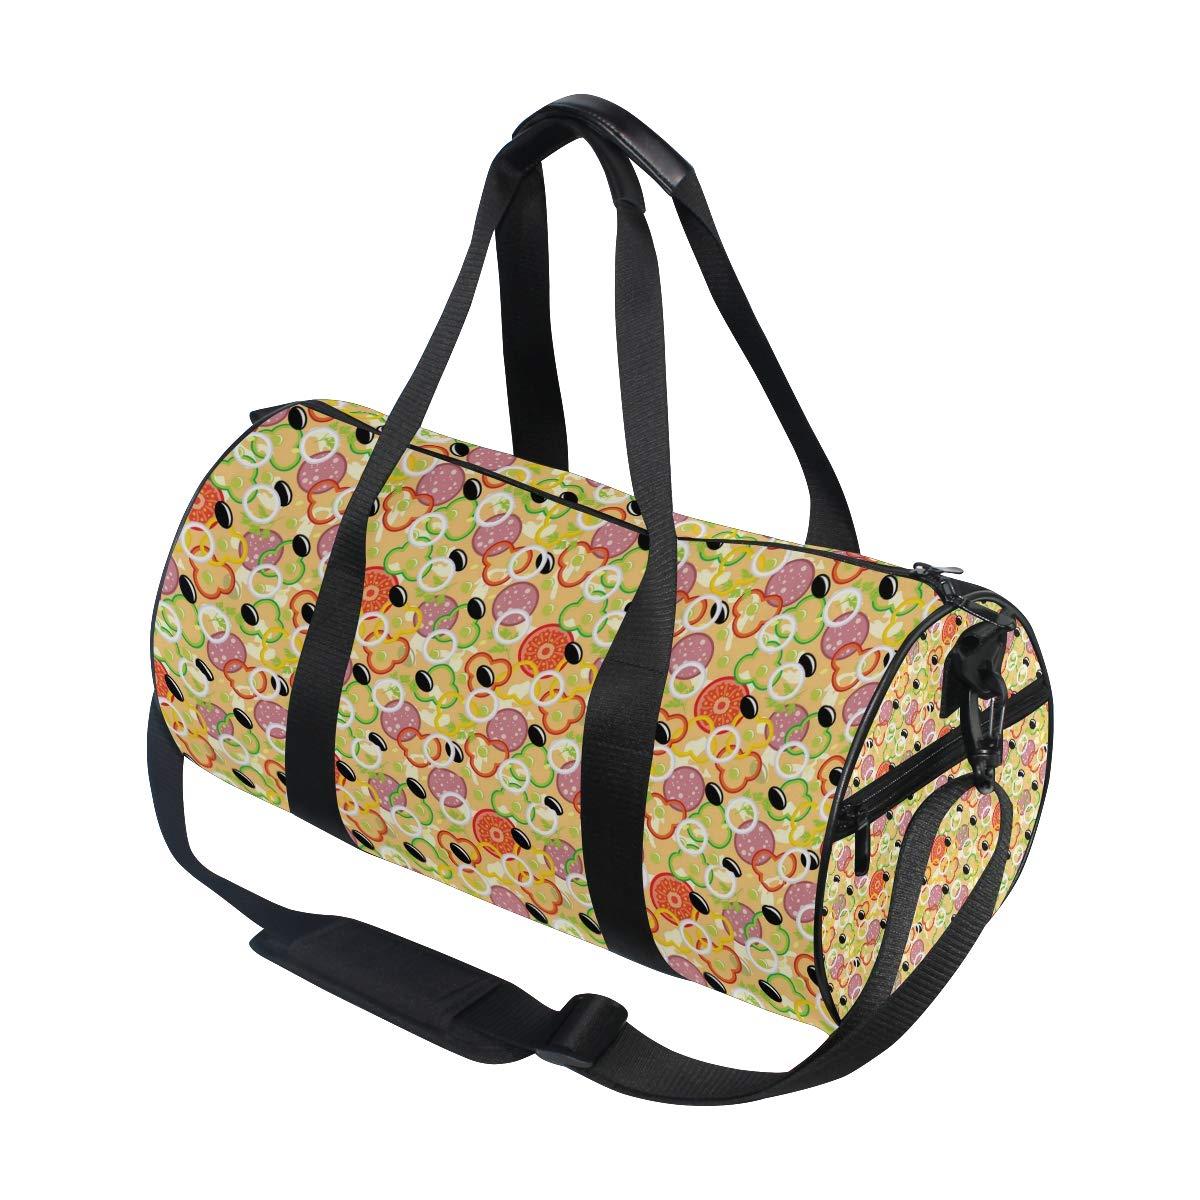 Waterproof Non-Slip Wearable Crossbody Bag fitness bag Shoulder Bag Grow Vegetables Picture